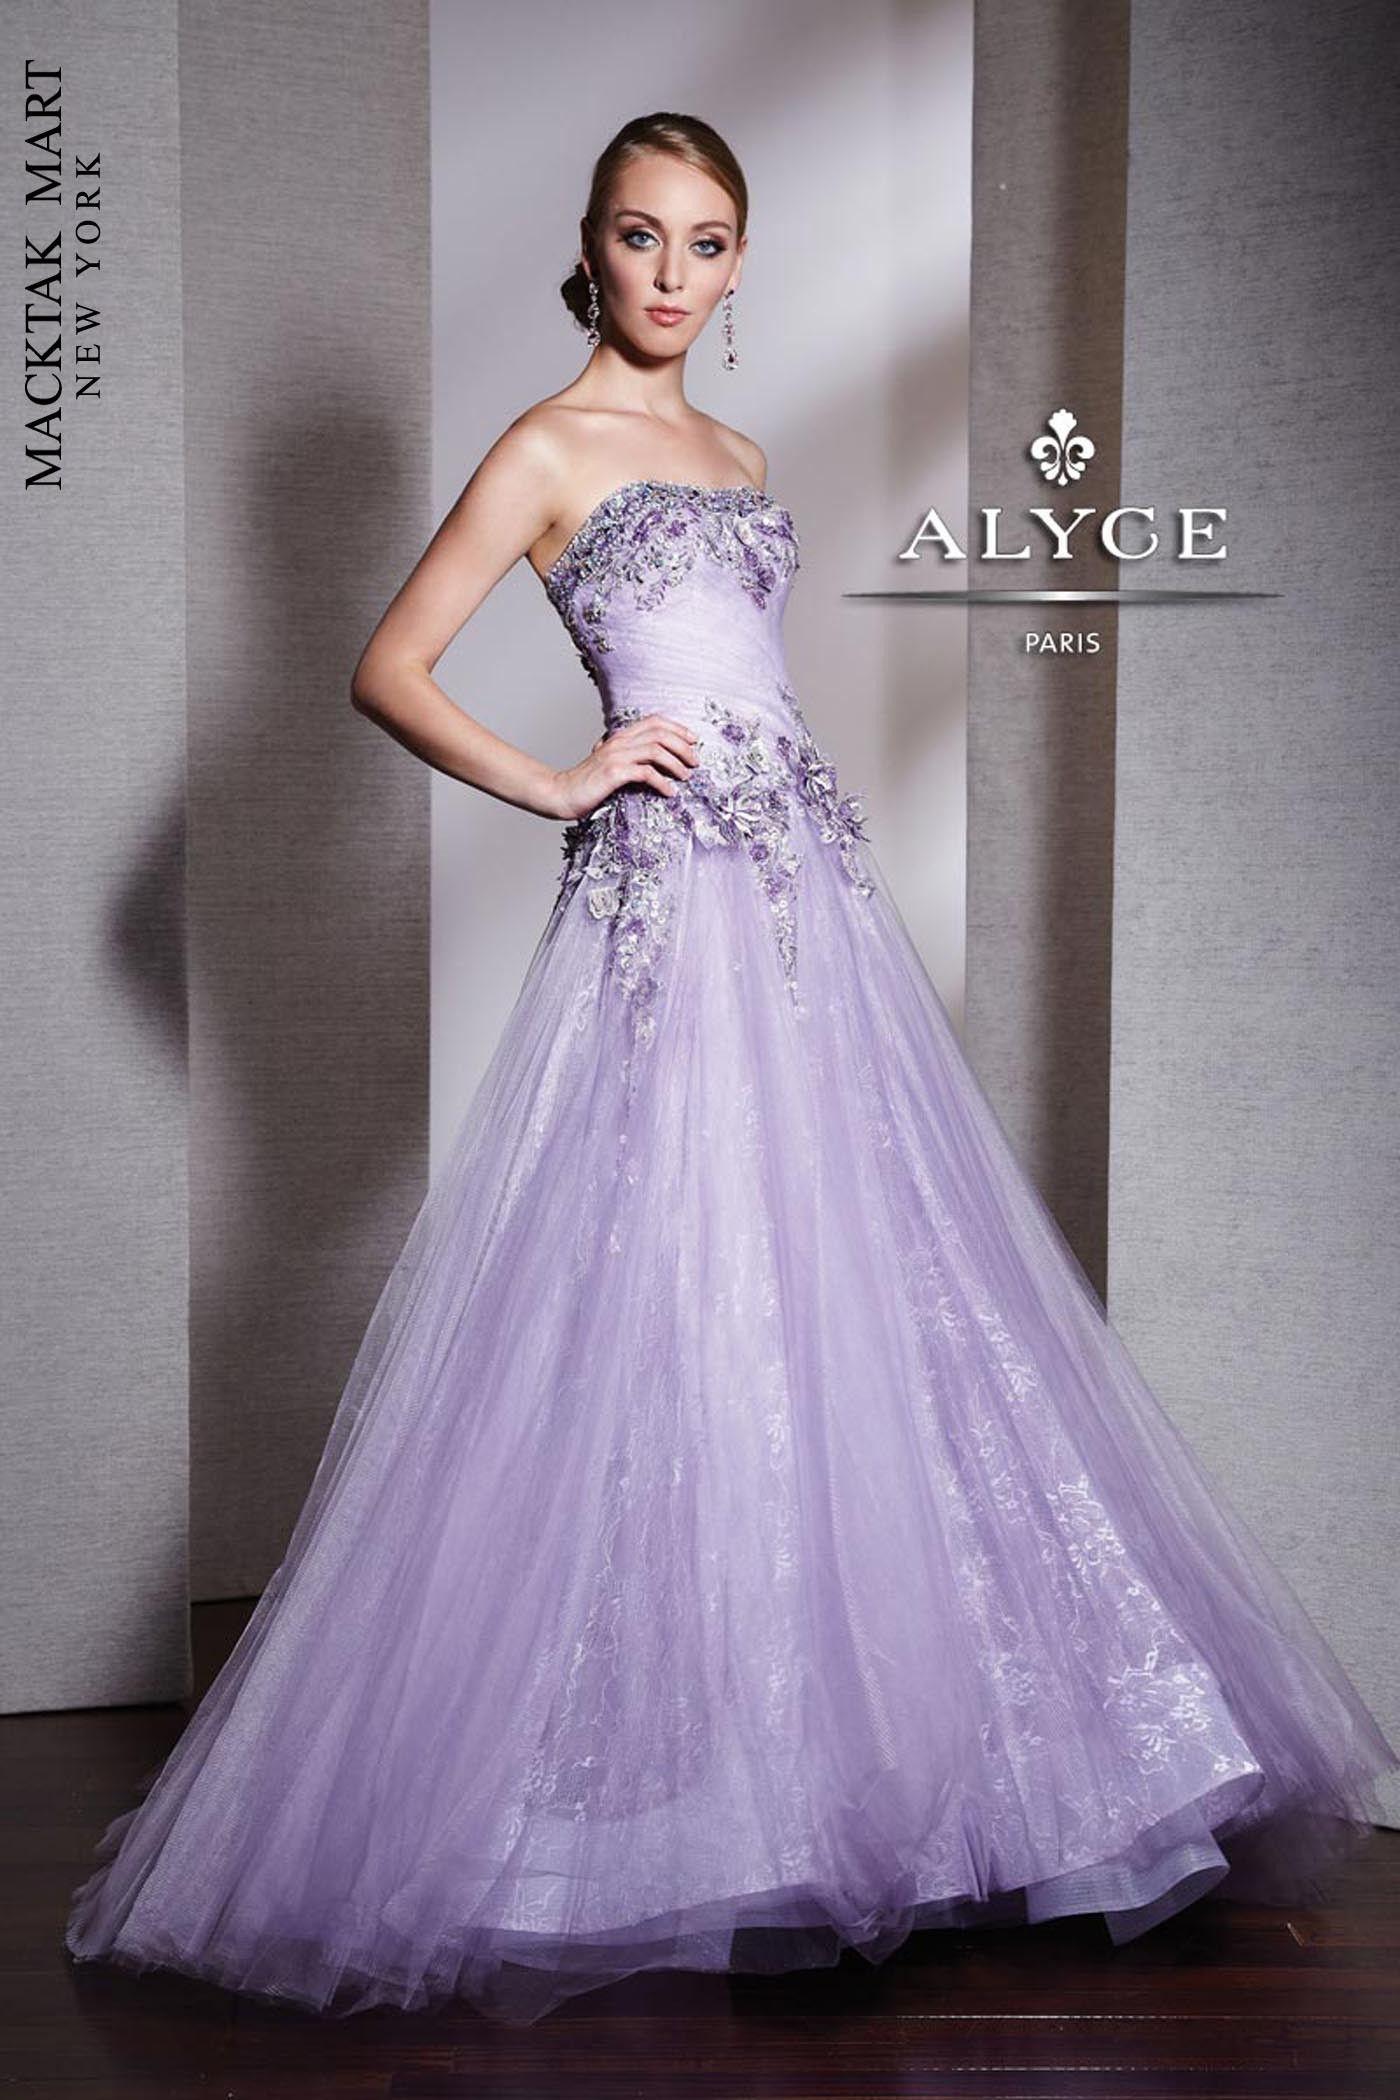 Alyce Black Label 5513 Dress $798.00 | Noches Estelares ...